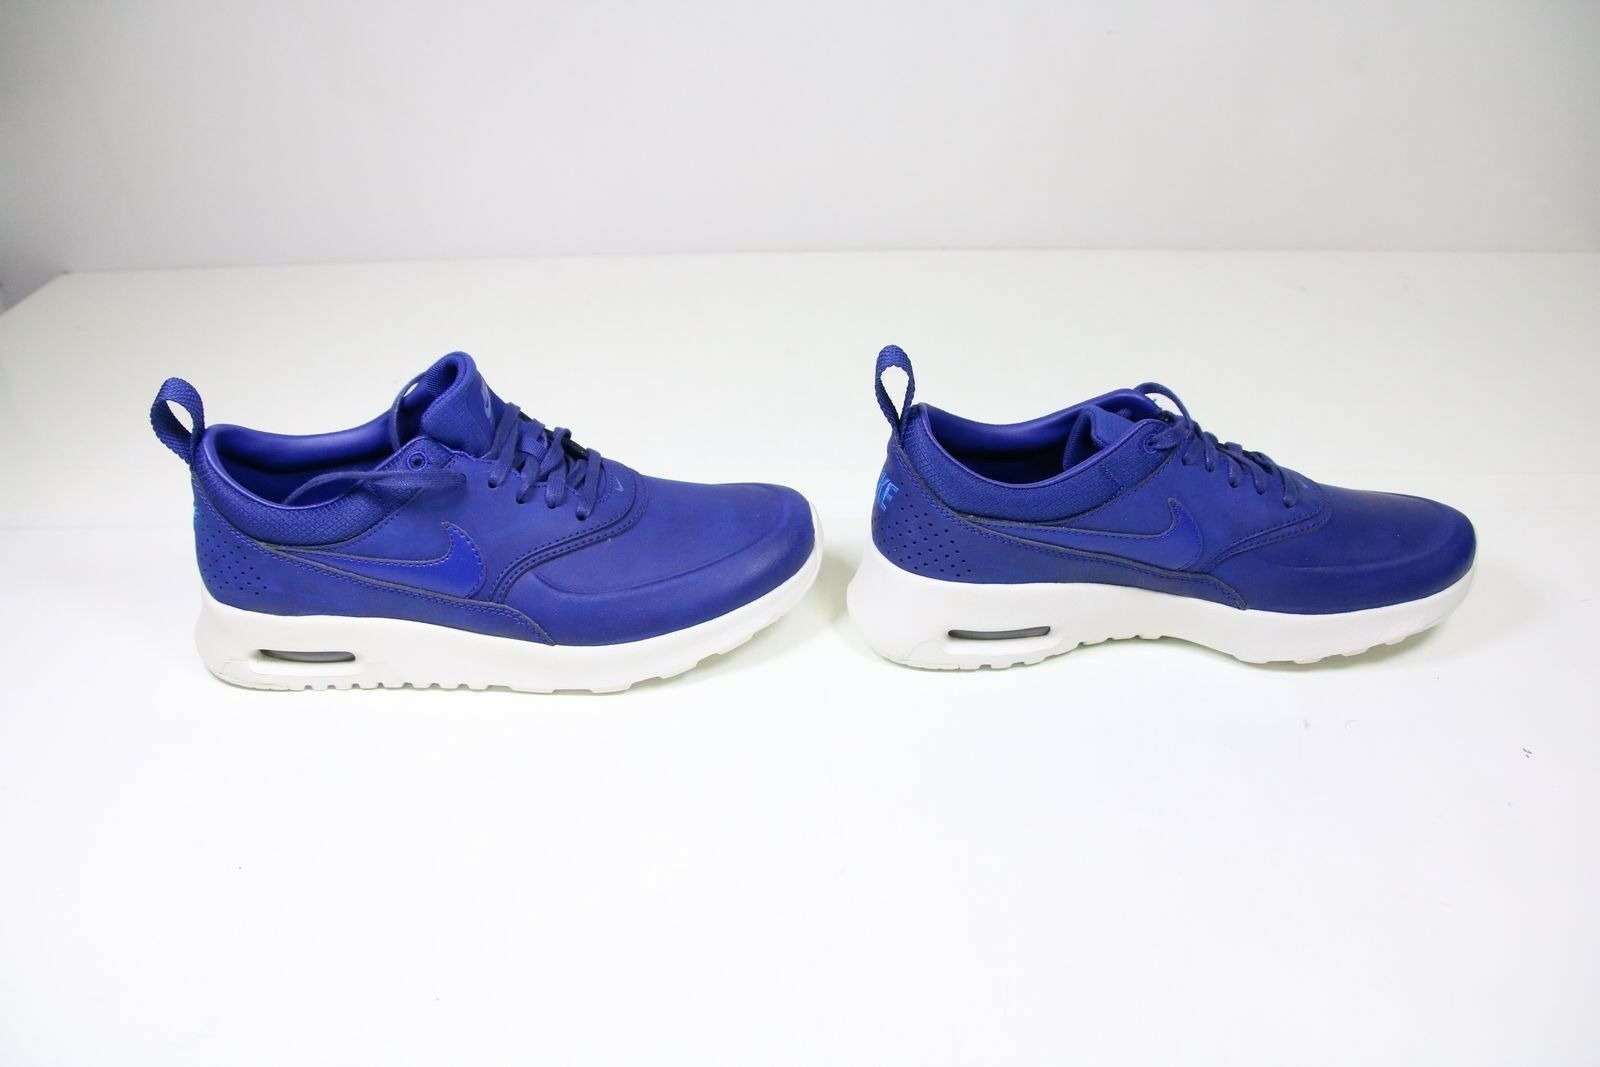 Nike Vereinigtes air max thea premium wmn US 6.5 Vereinigtes Nike Königreich 4 CM 23.5 5d9946